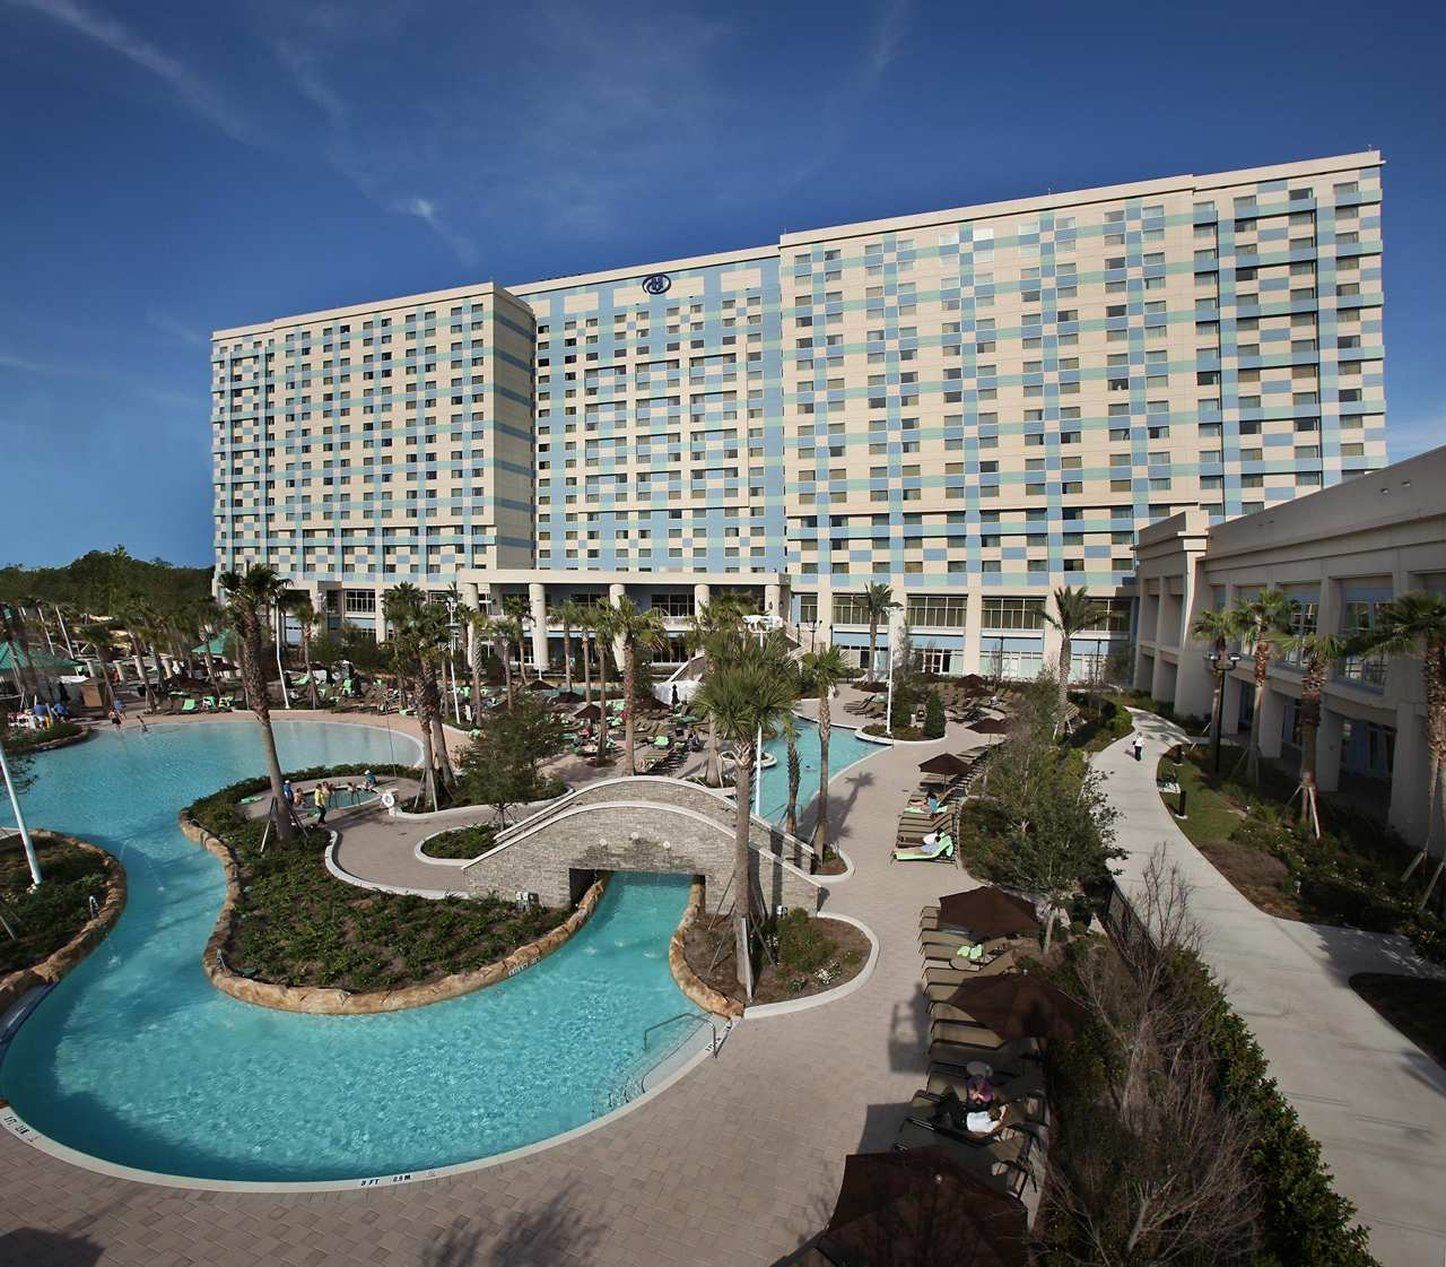 Hilton Orlando Bonnet Creek 145 3 0 6 Updated 2018 Prices Hotel Reviews Fl Tripadvisor